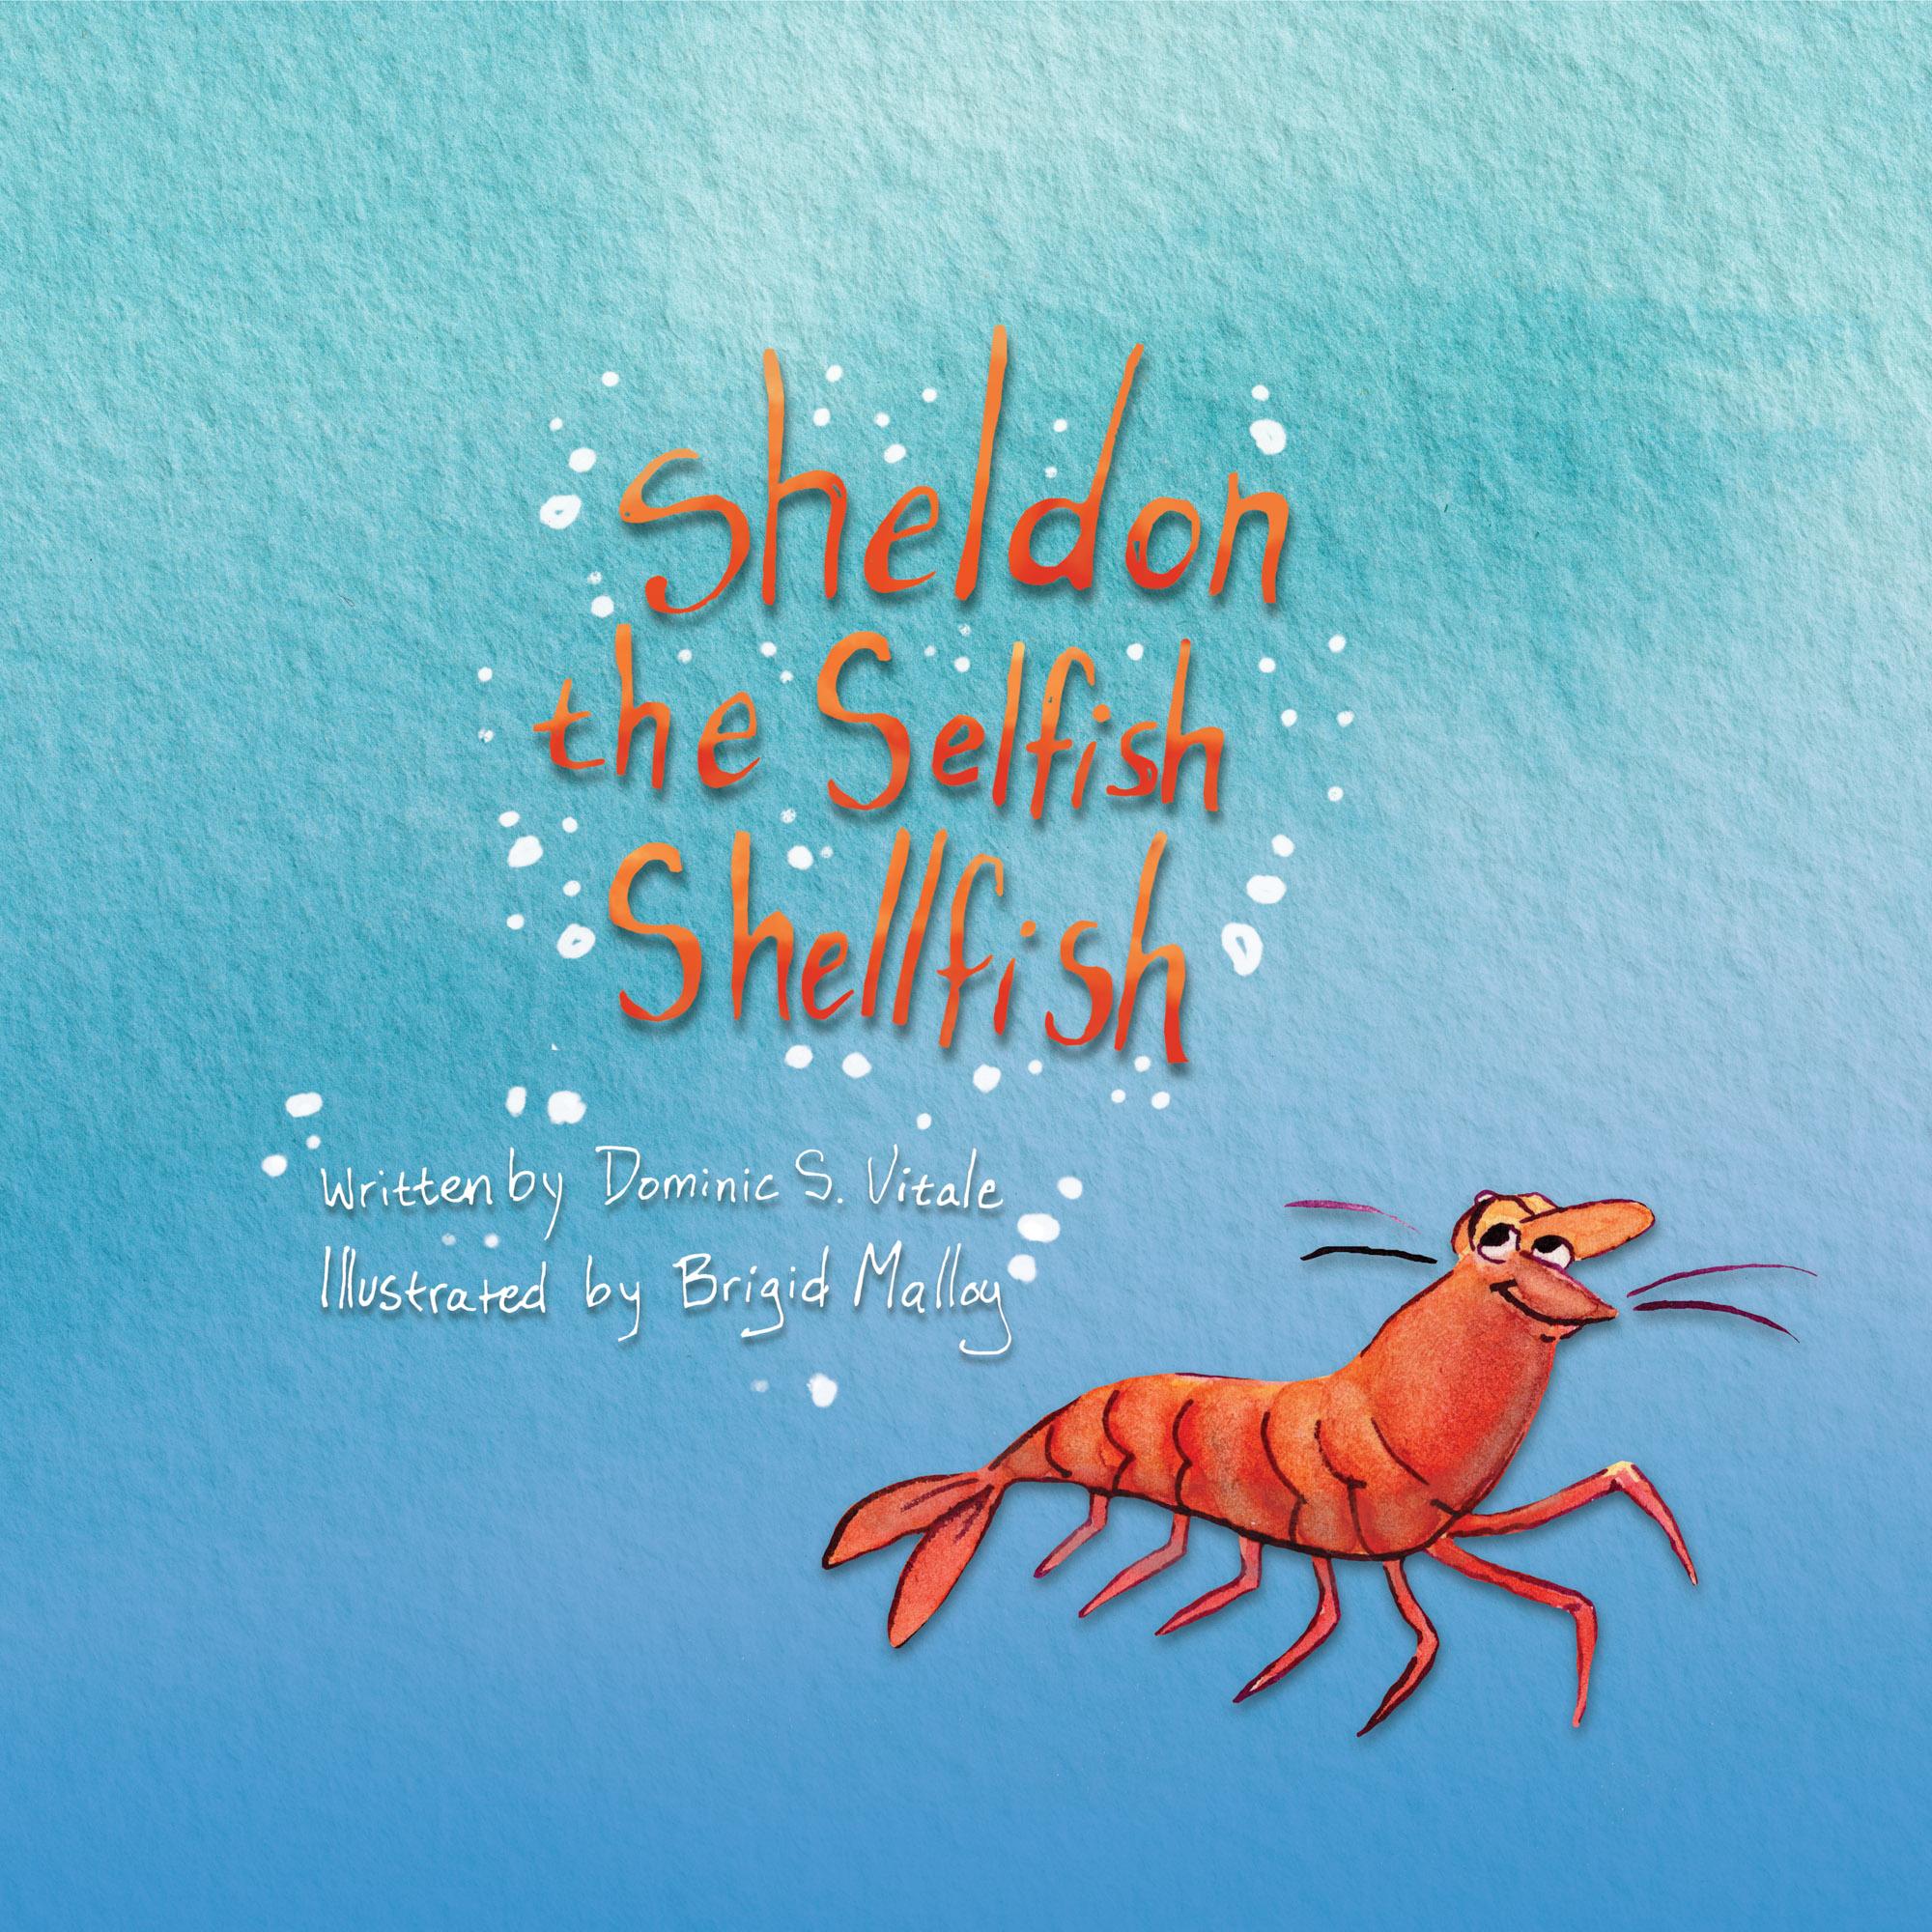 Sheldon The Selfish shellfish